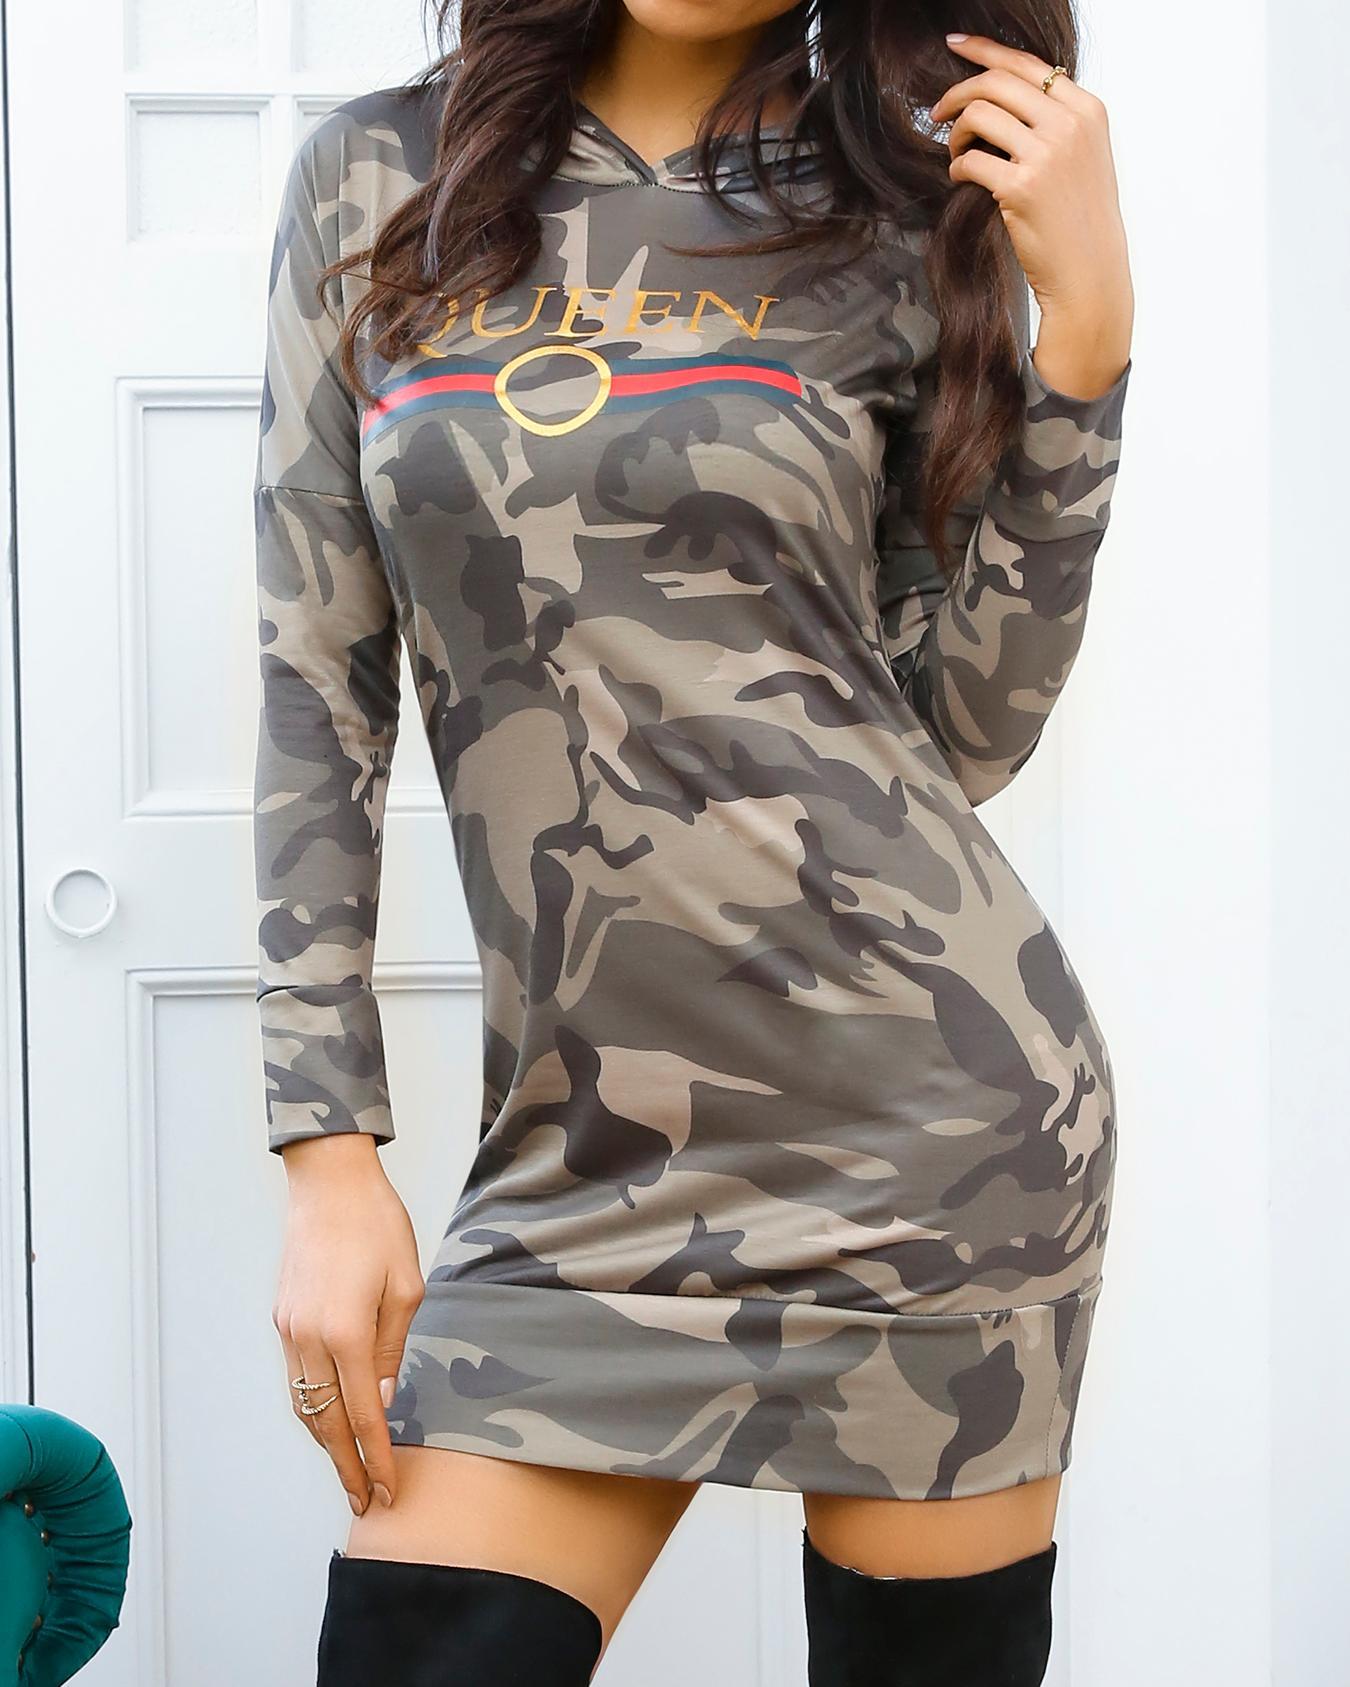 Stylish Camouflage Print Casual Hoodie Dress